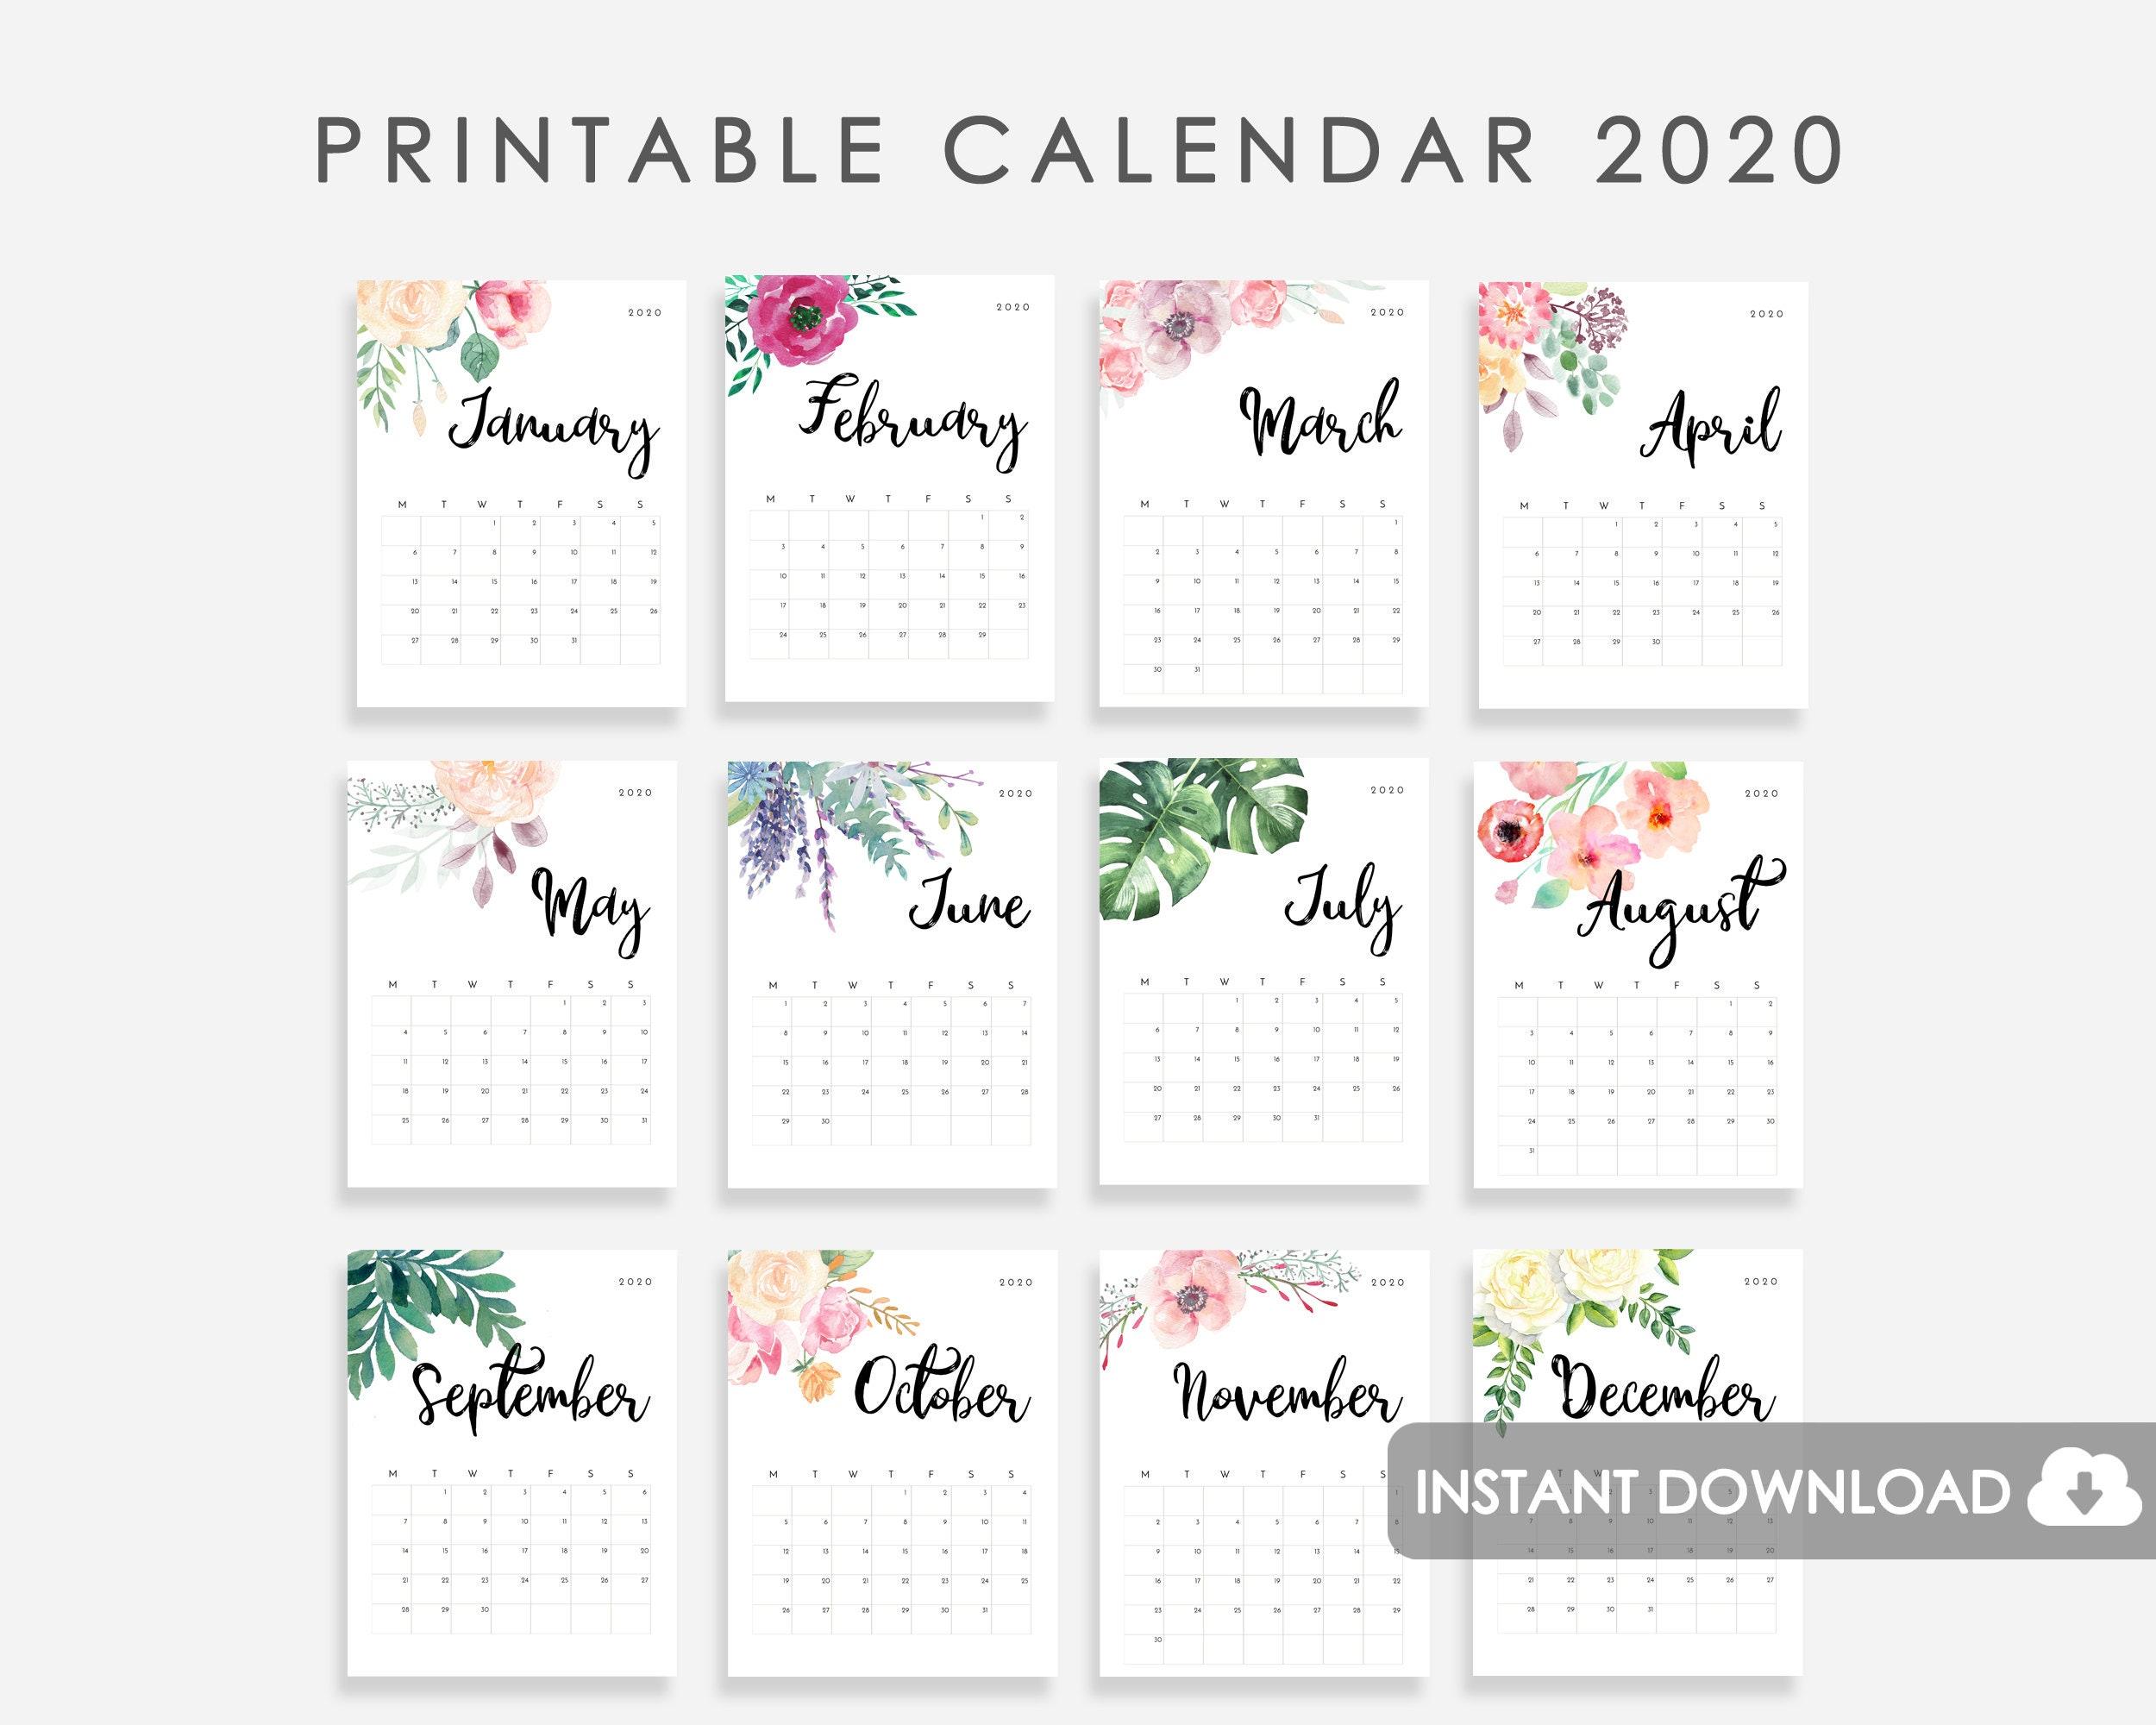 Desk Calendar 2020.2020 Calendar Printable Desk Calendar 2020 2020 Wall Calendar Watercolor Flowers Calendar 2020 2020 Desk Calendar 2020